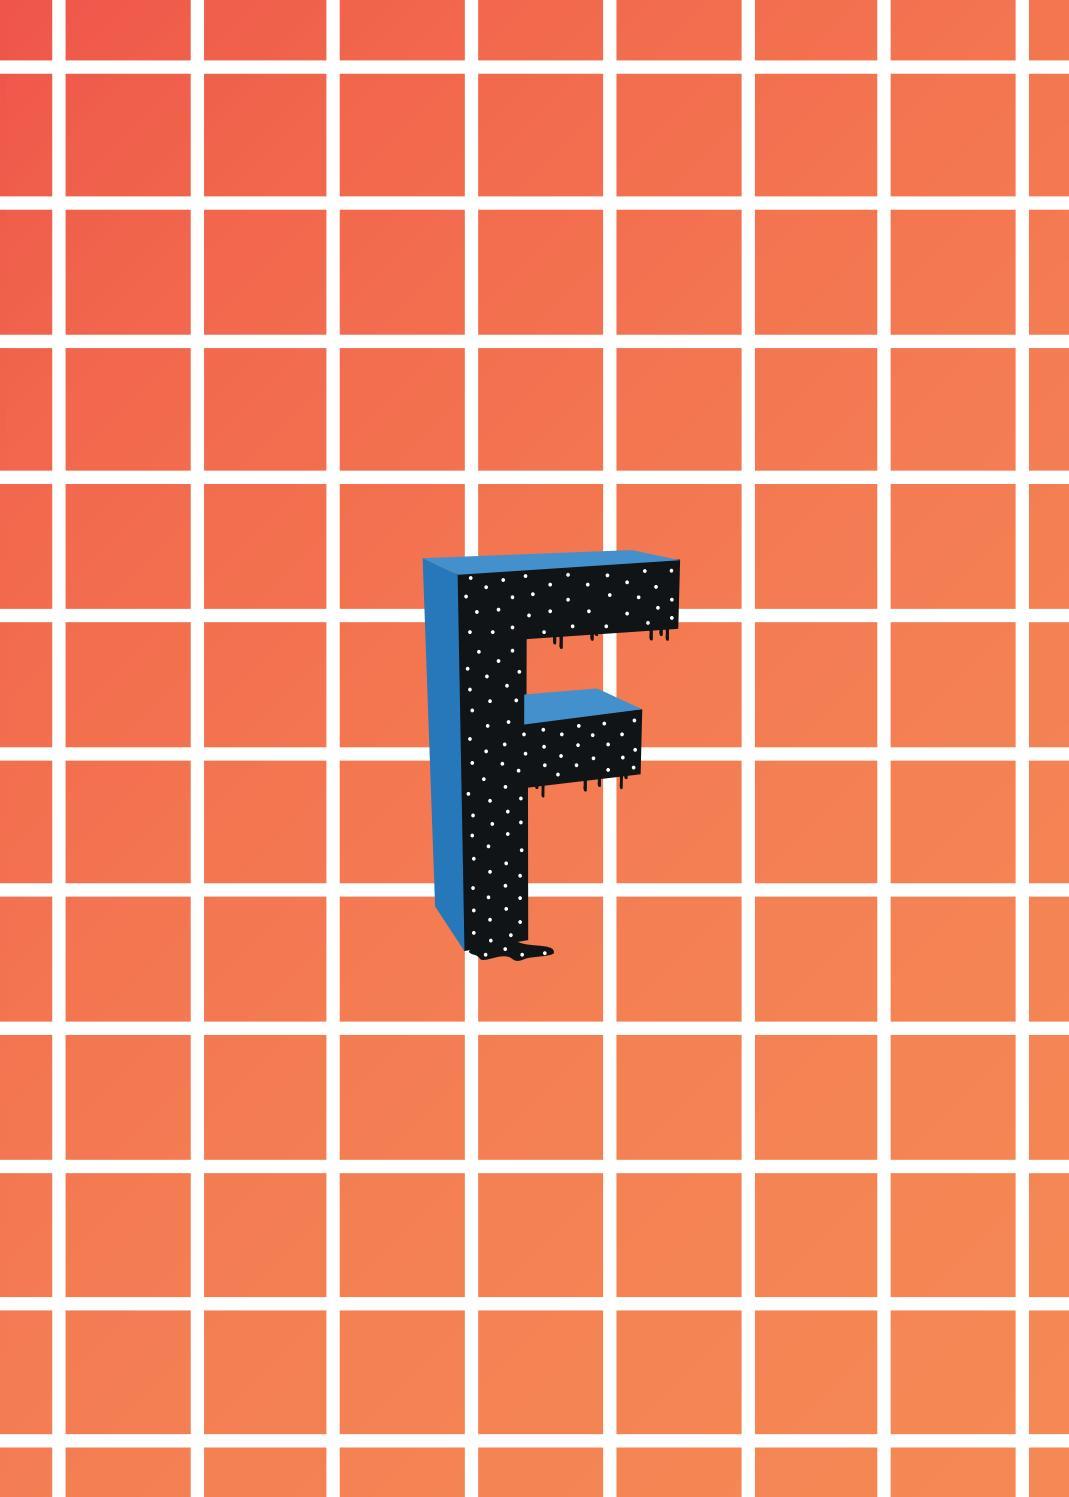 15ff Catálogo De Programación By Festifreak Festival